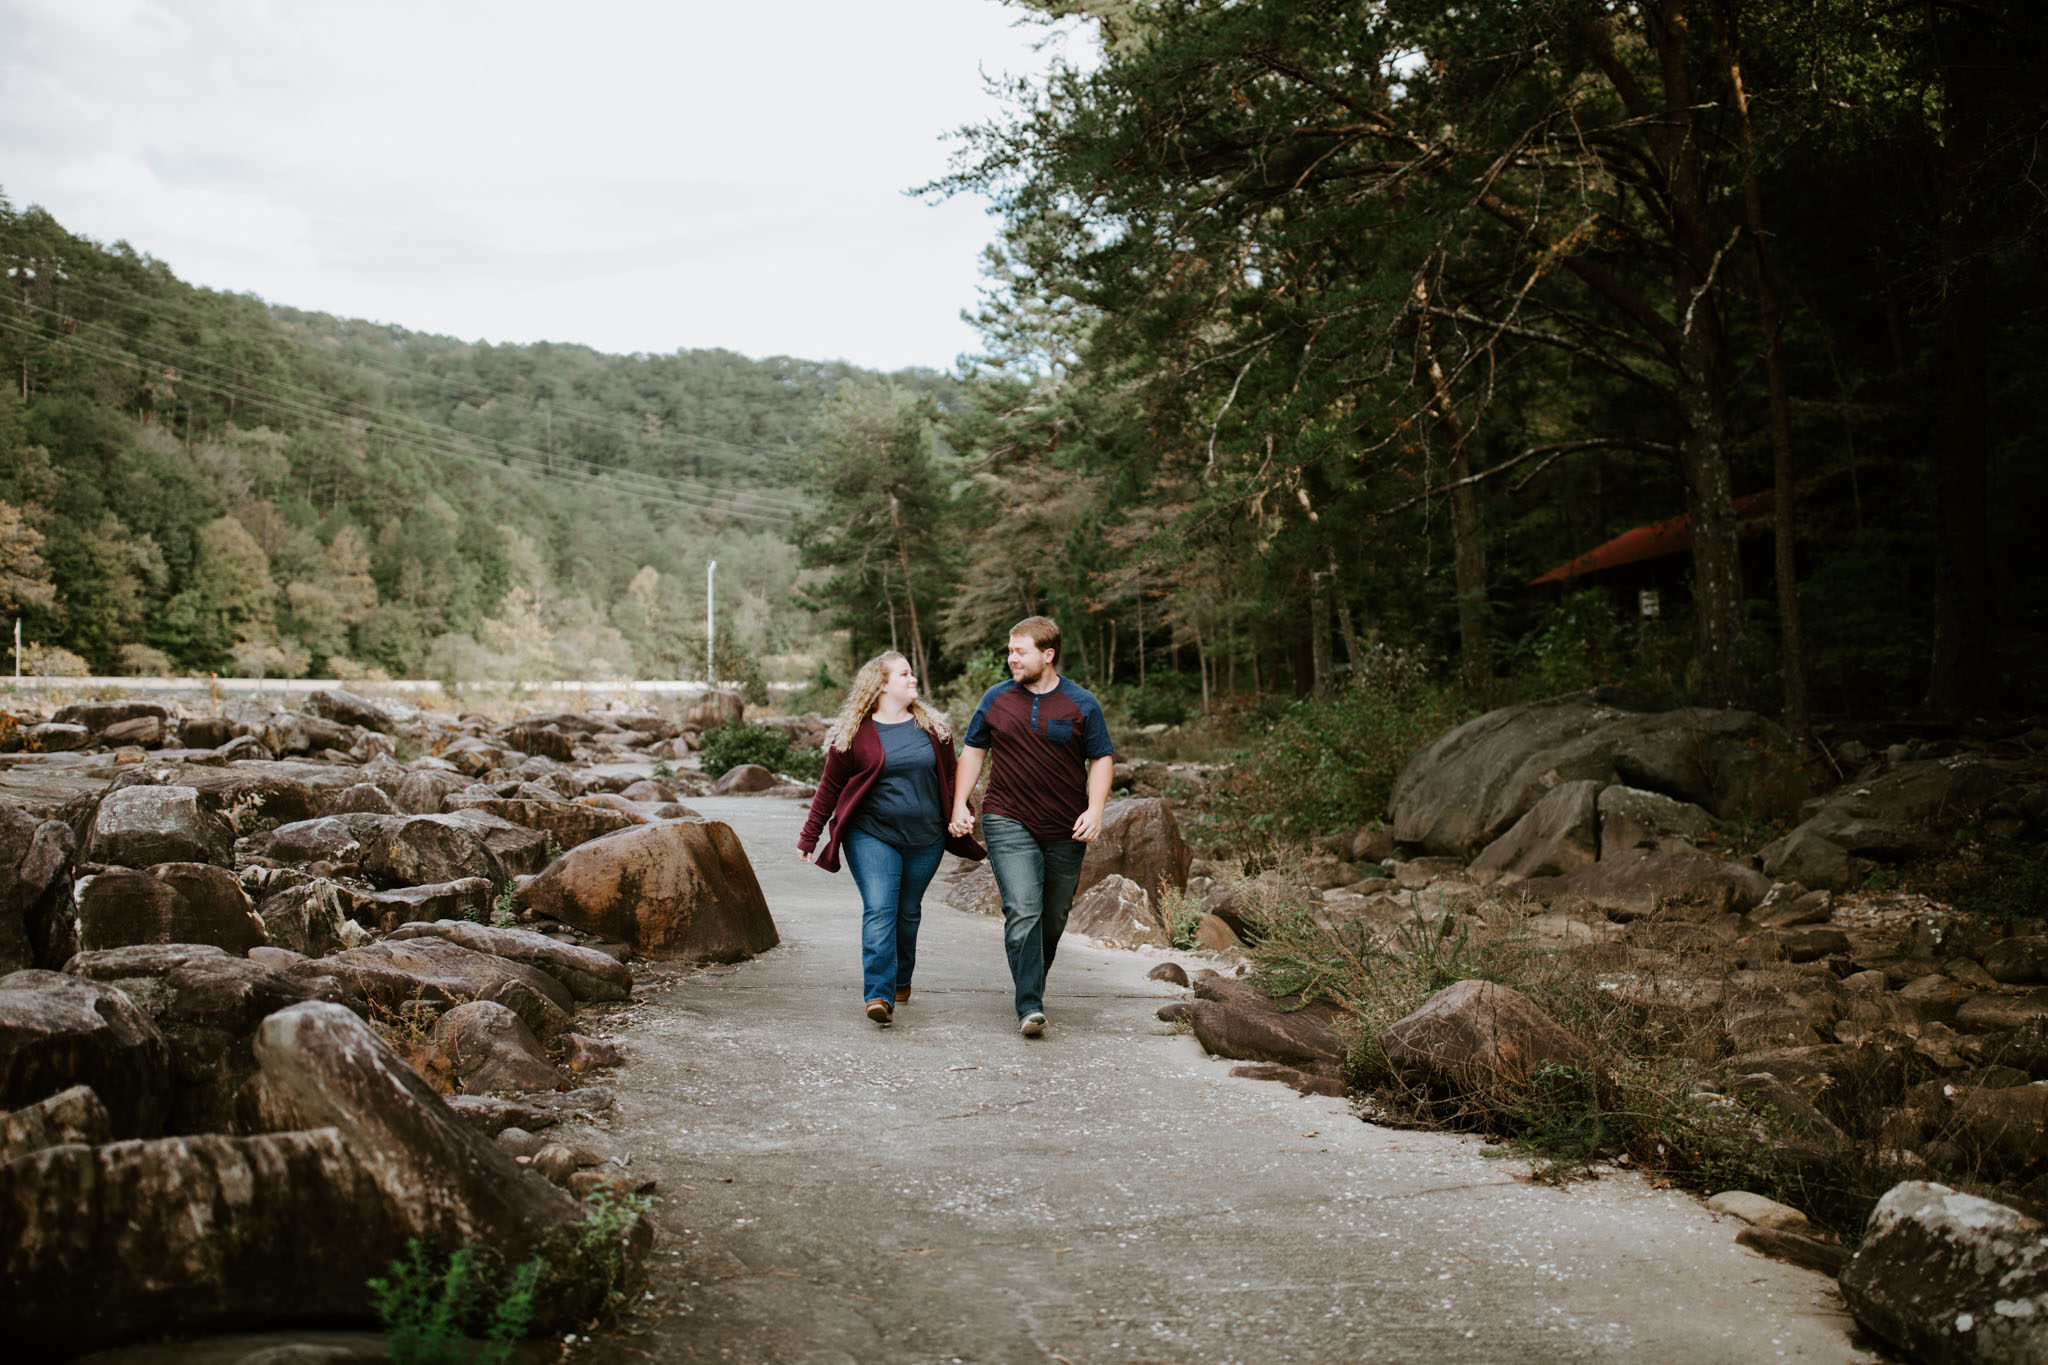 Kaitlin + Blake + Chattanooga + Tennessee + Engagement + Ocoee River + Wedding + Photographer-23.jpg